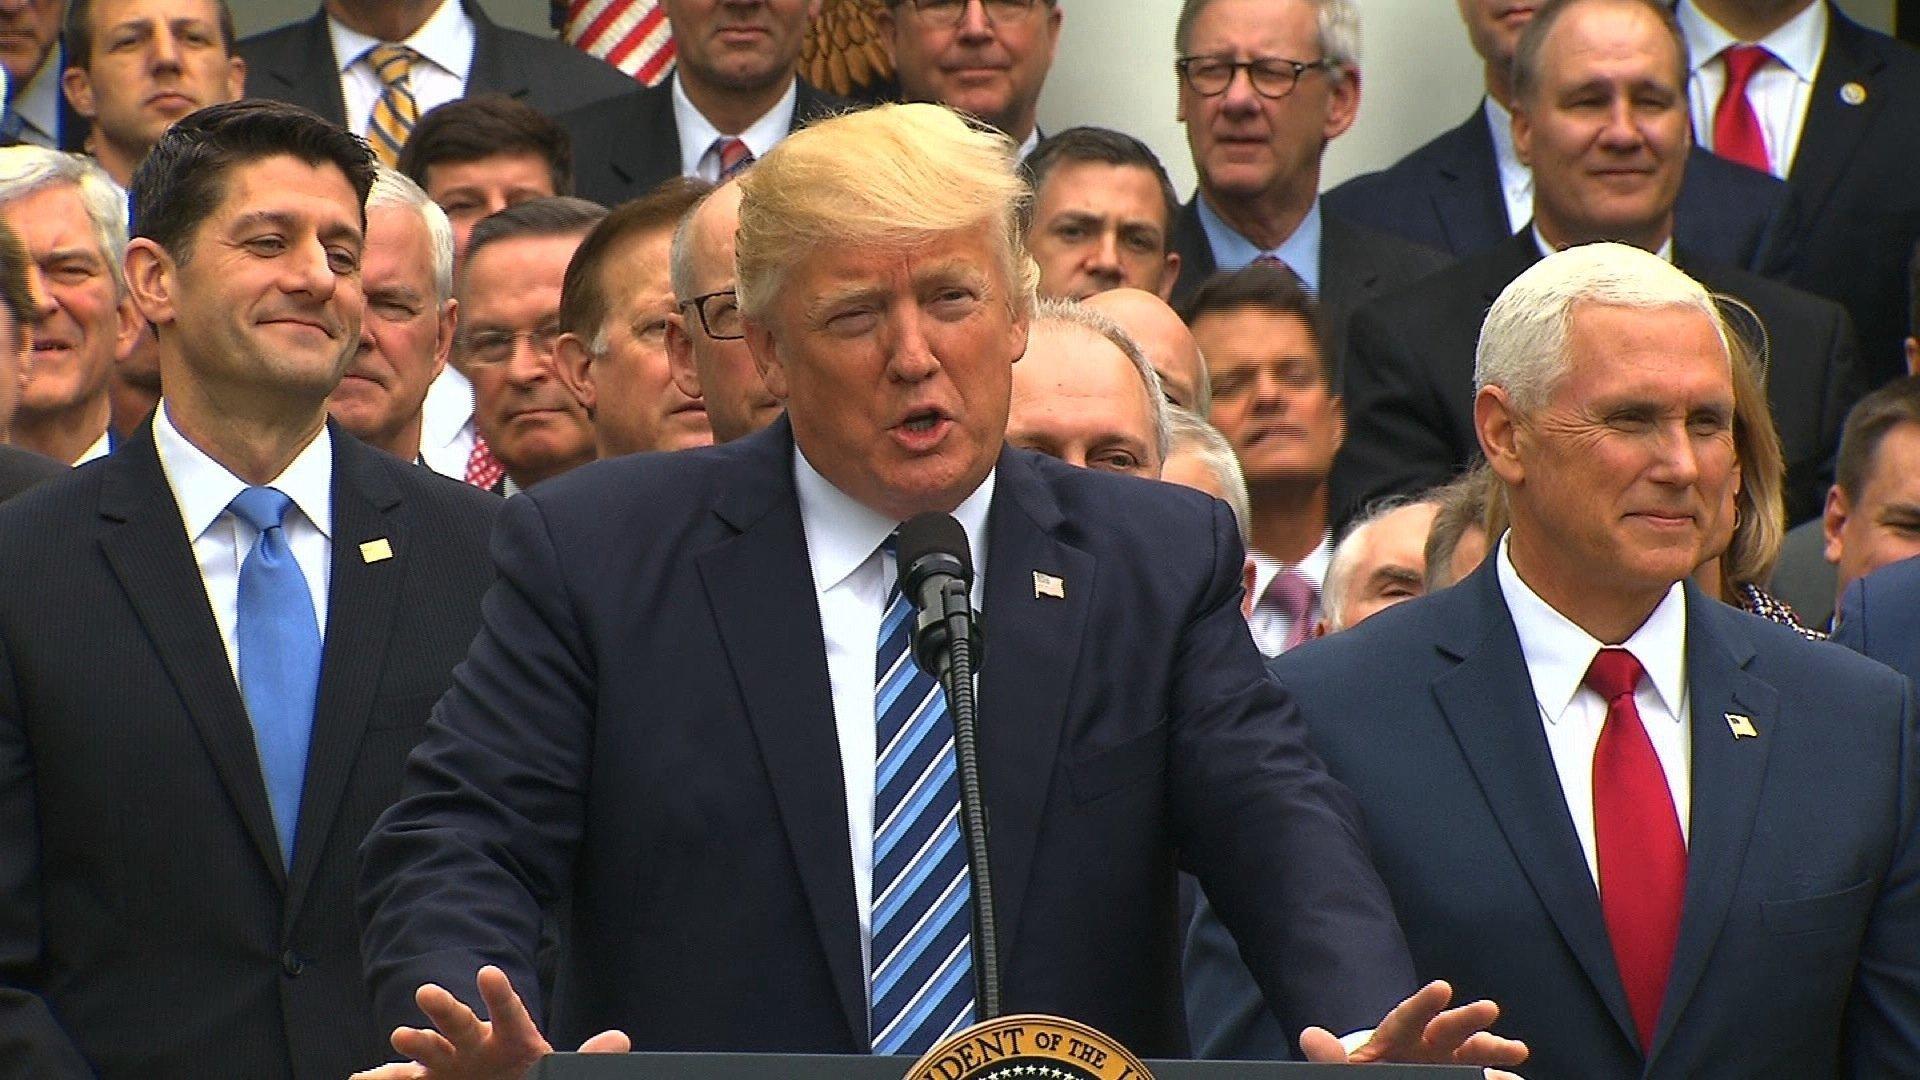 House Republicans Rush Vote on Health Care Bill